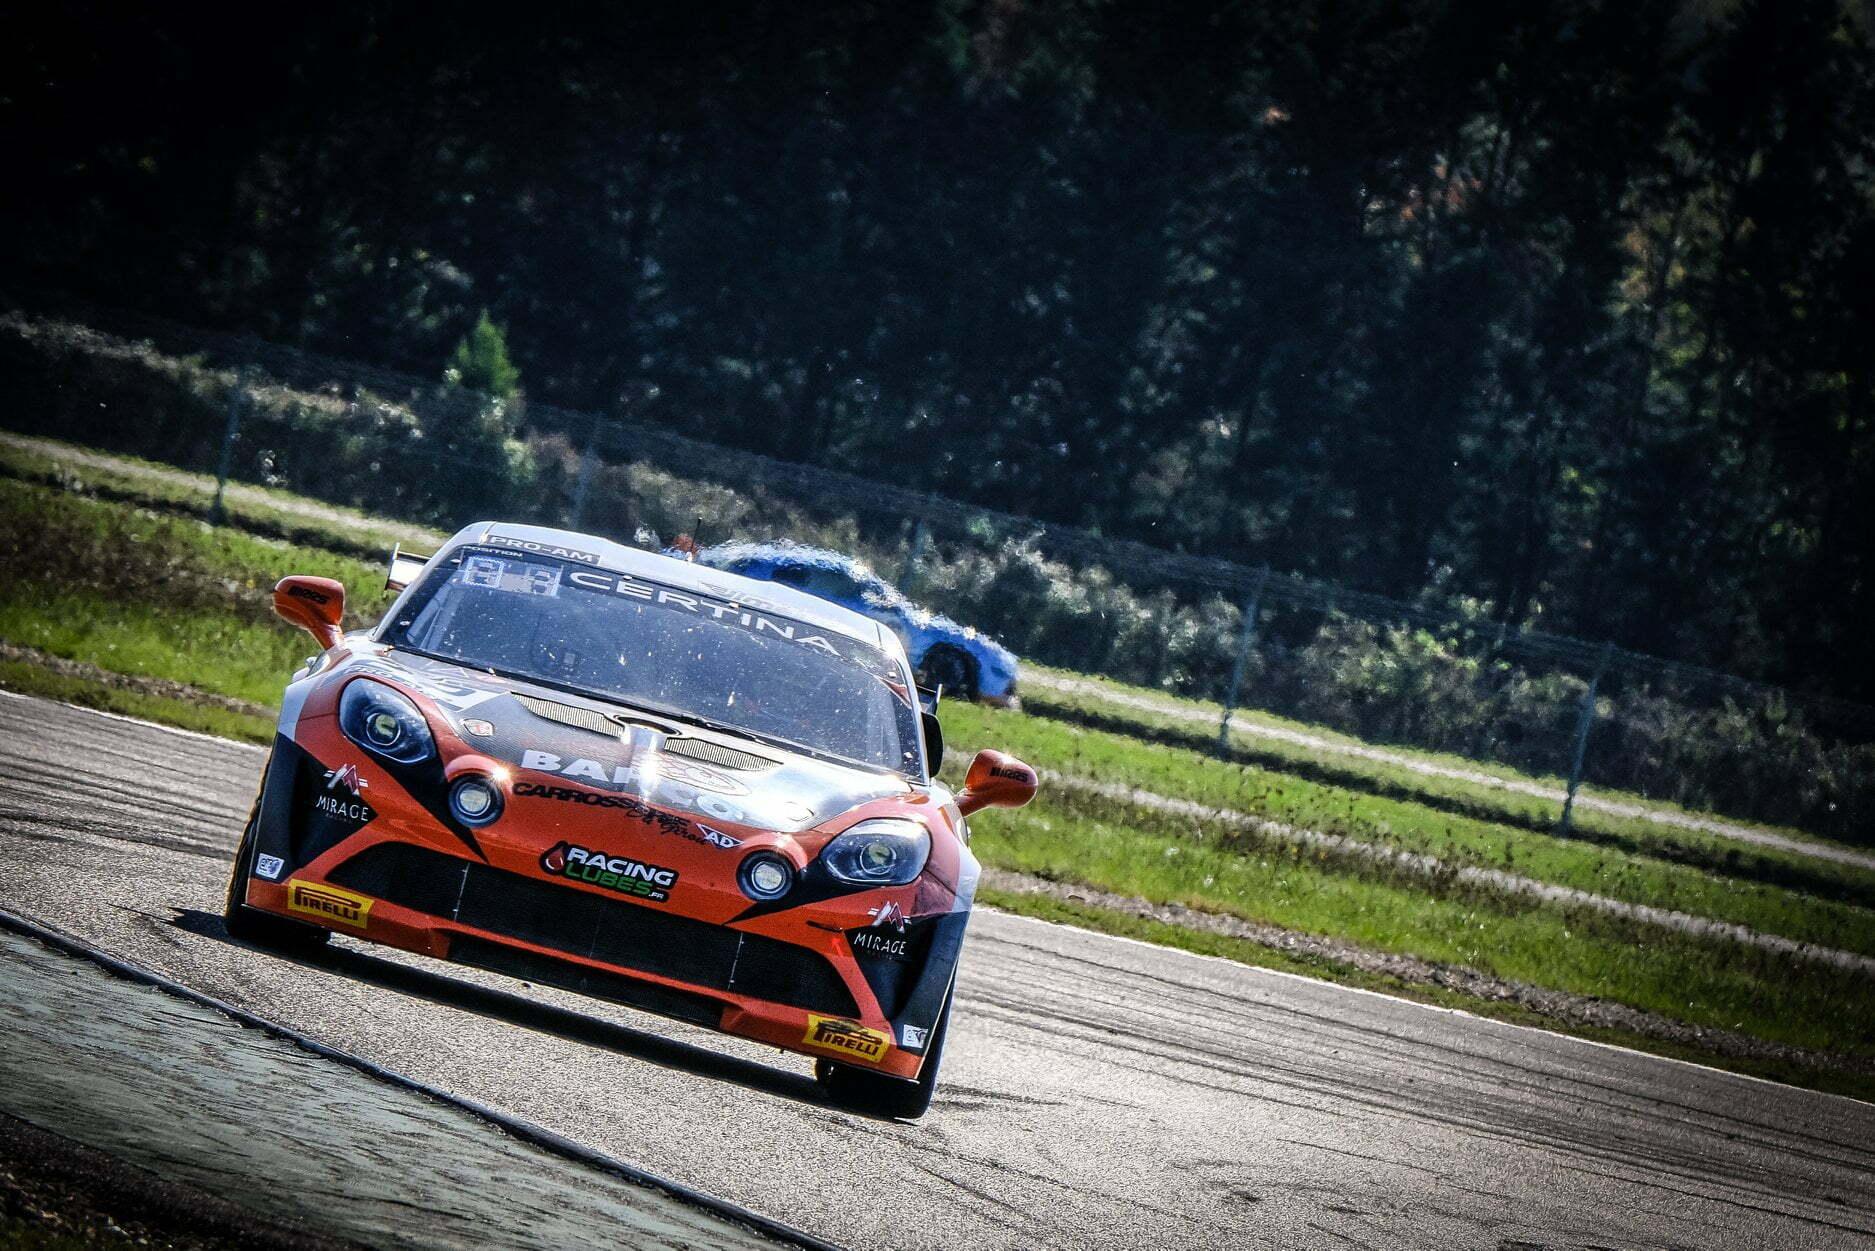 Alpine A110 GT4 FFSA GT 2020 Albi Course 2 12 | Alpine A110 GT4 : Herrero et Moullin-Traffort performent à Albi !